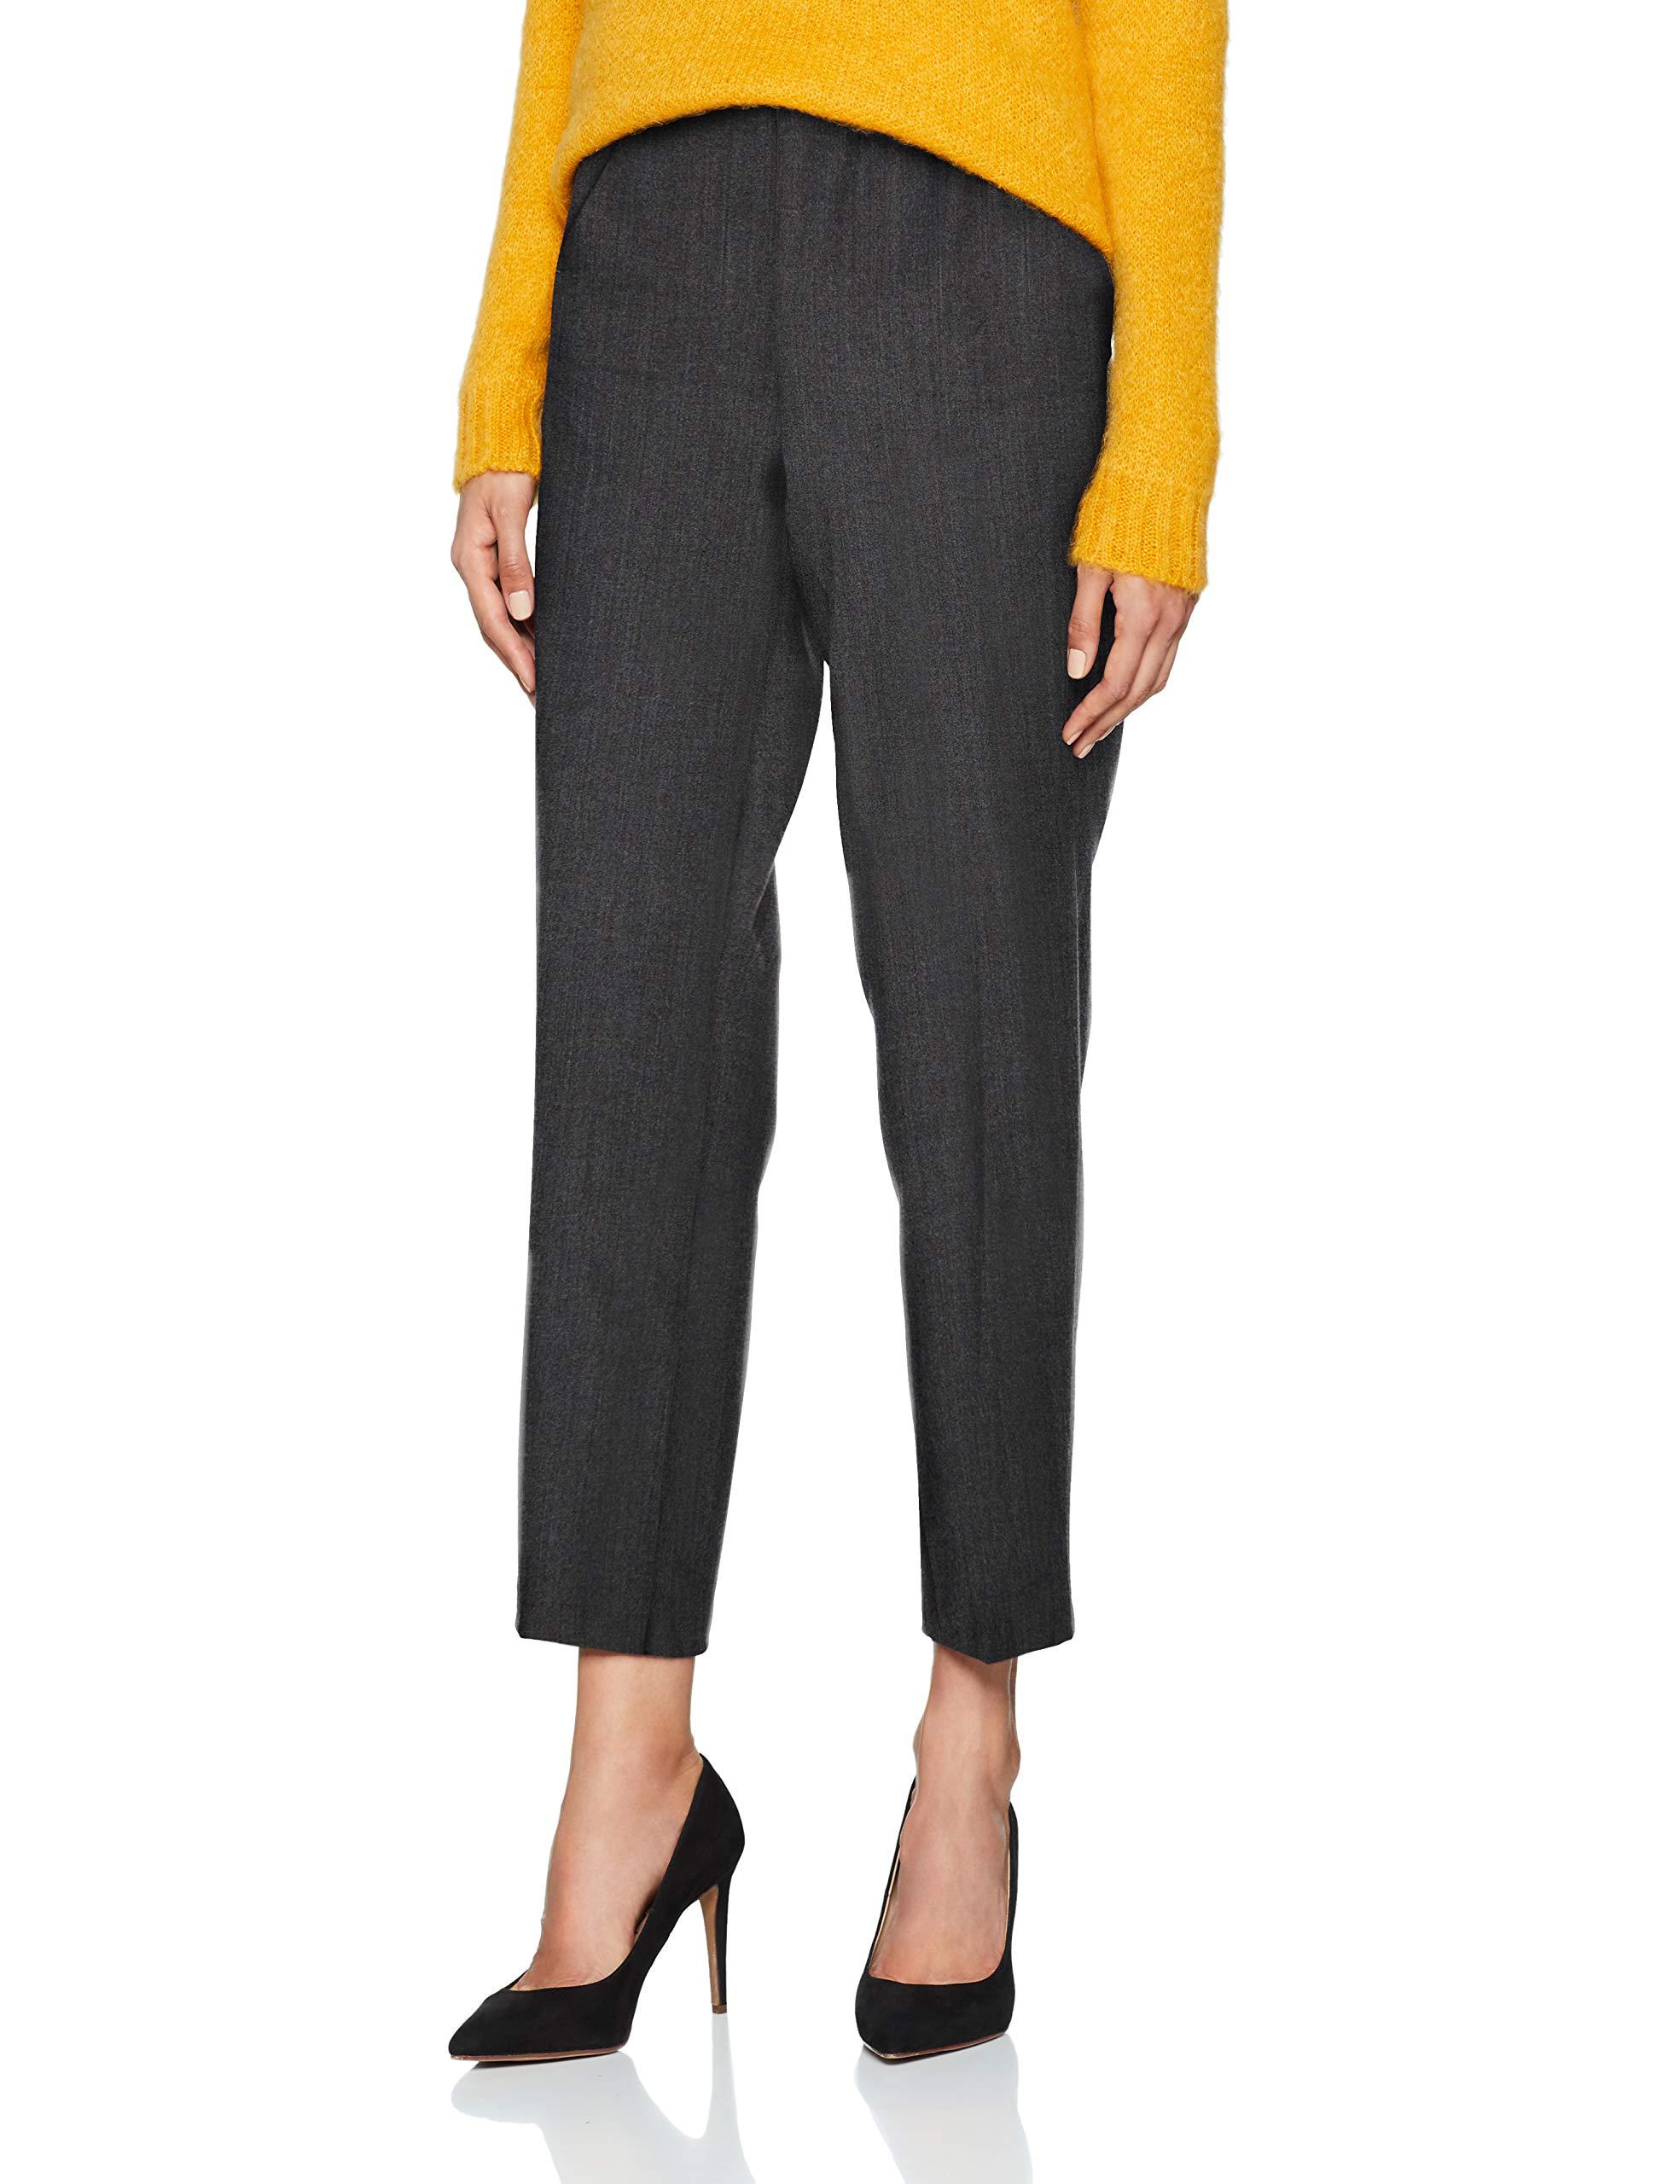 Droit Of 90742taille Colors Fabricant46 United TrousersPantalon Gray Benetton FemmeGrisdark CxorWdBe